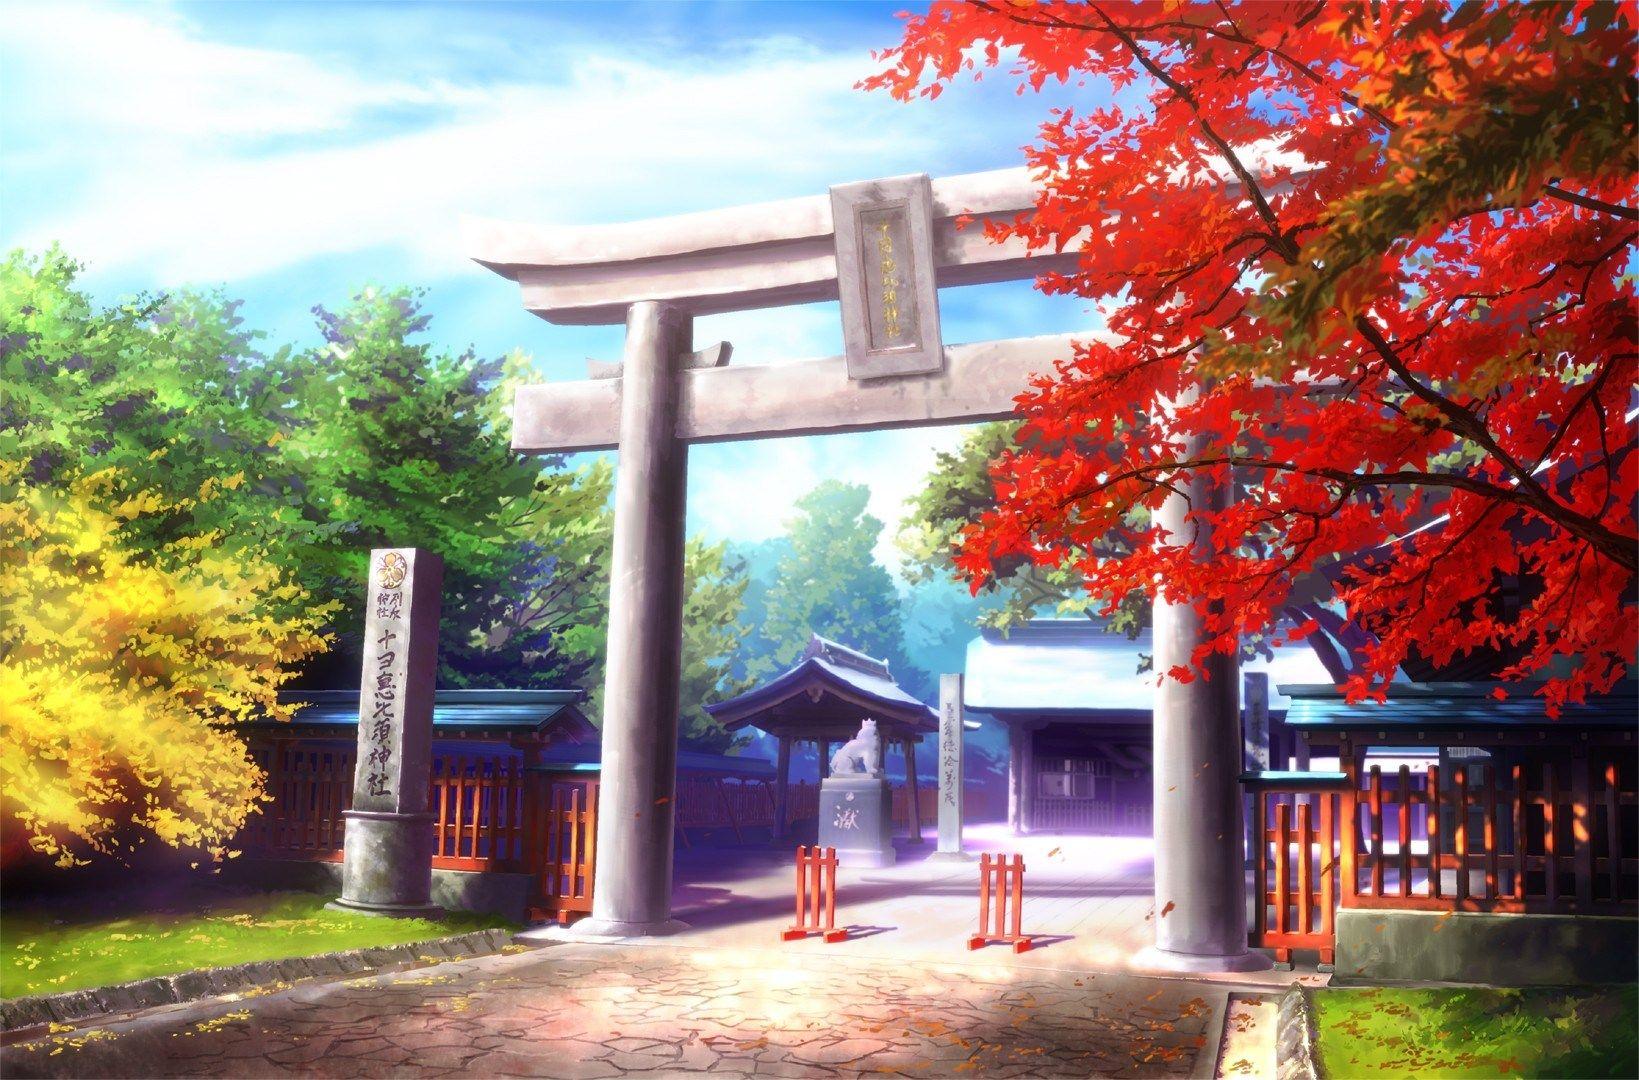 1639x1080 Free Screensaver Original Anime Scenery Wallpaper Scenery Wallpaper Anime Scenery